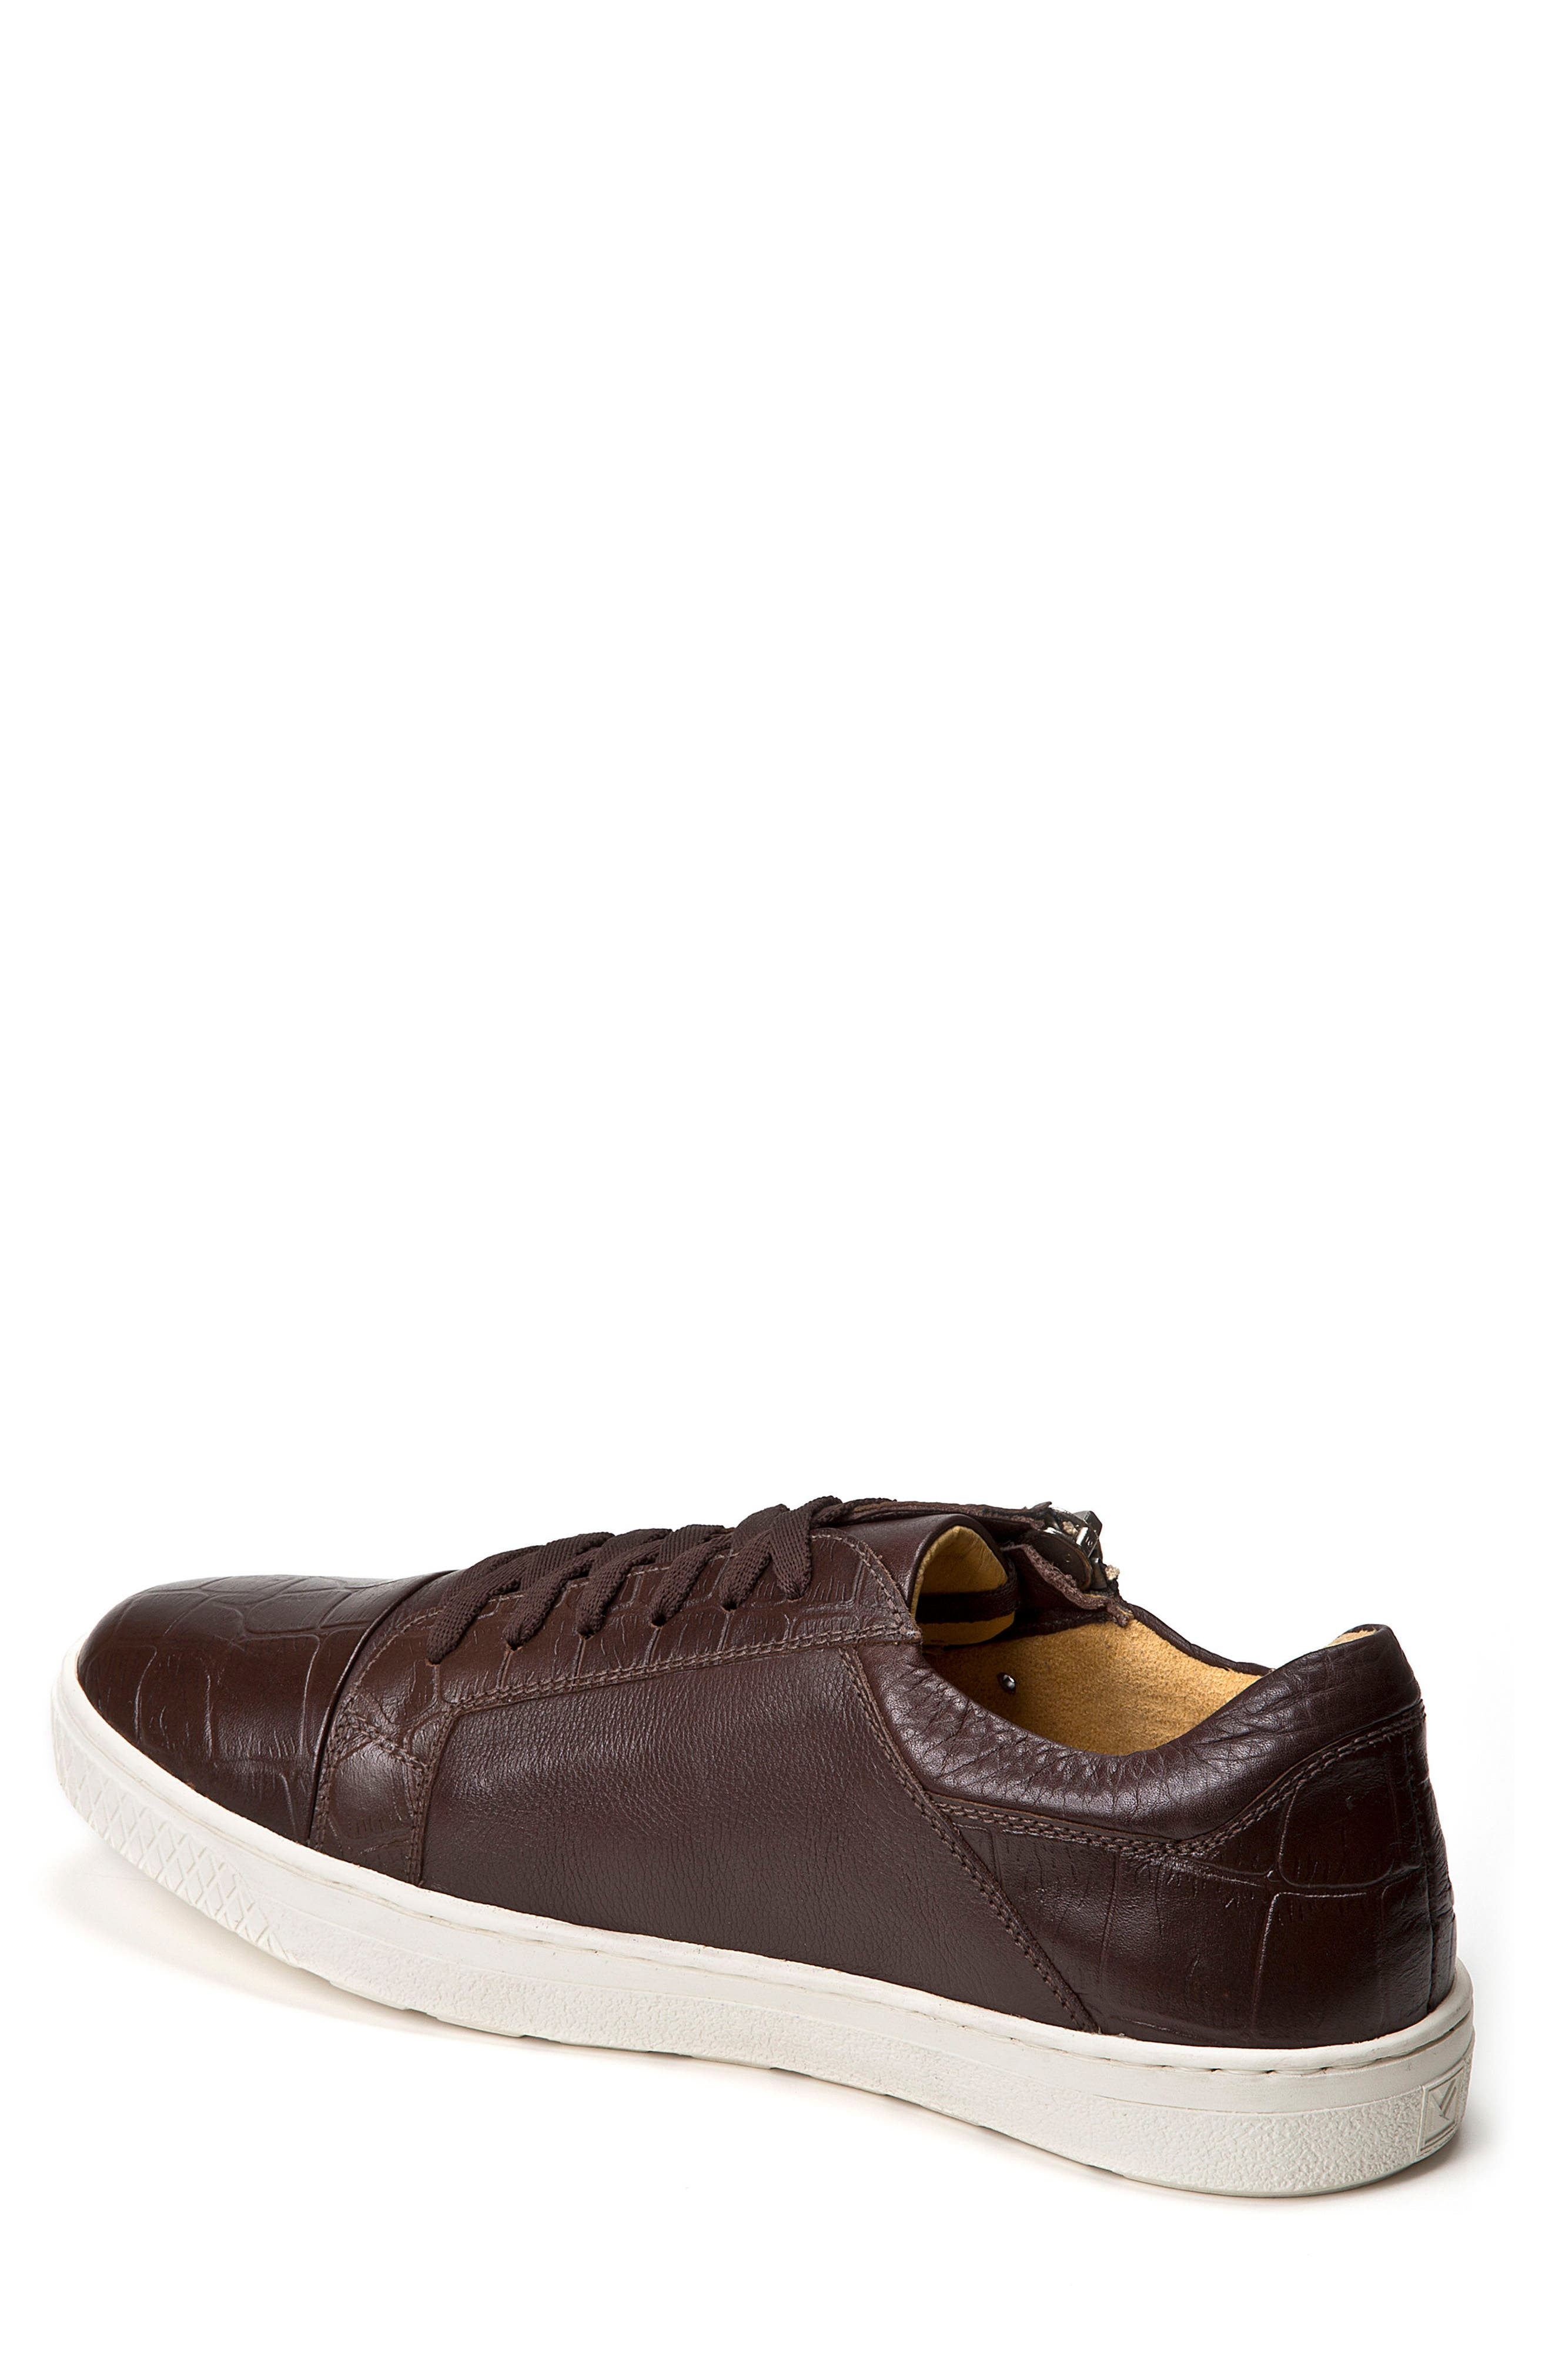 Alternate Image 2  - Sandro Moscoloni Cassius Side Zip Sneaker (Men)